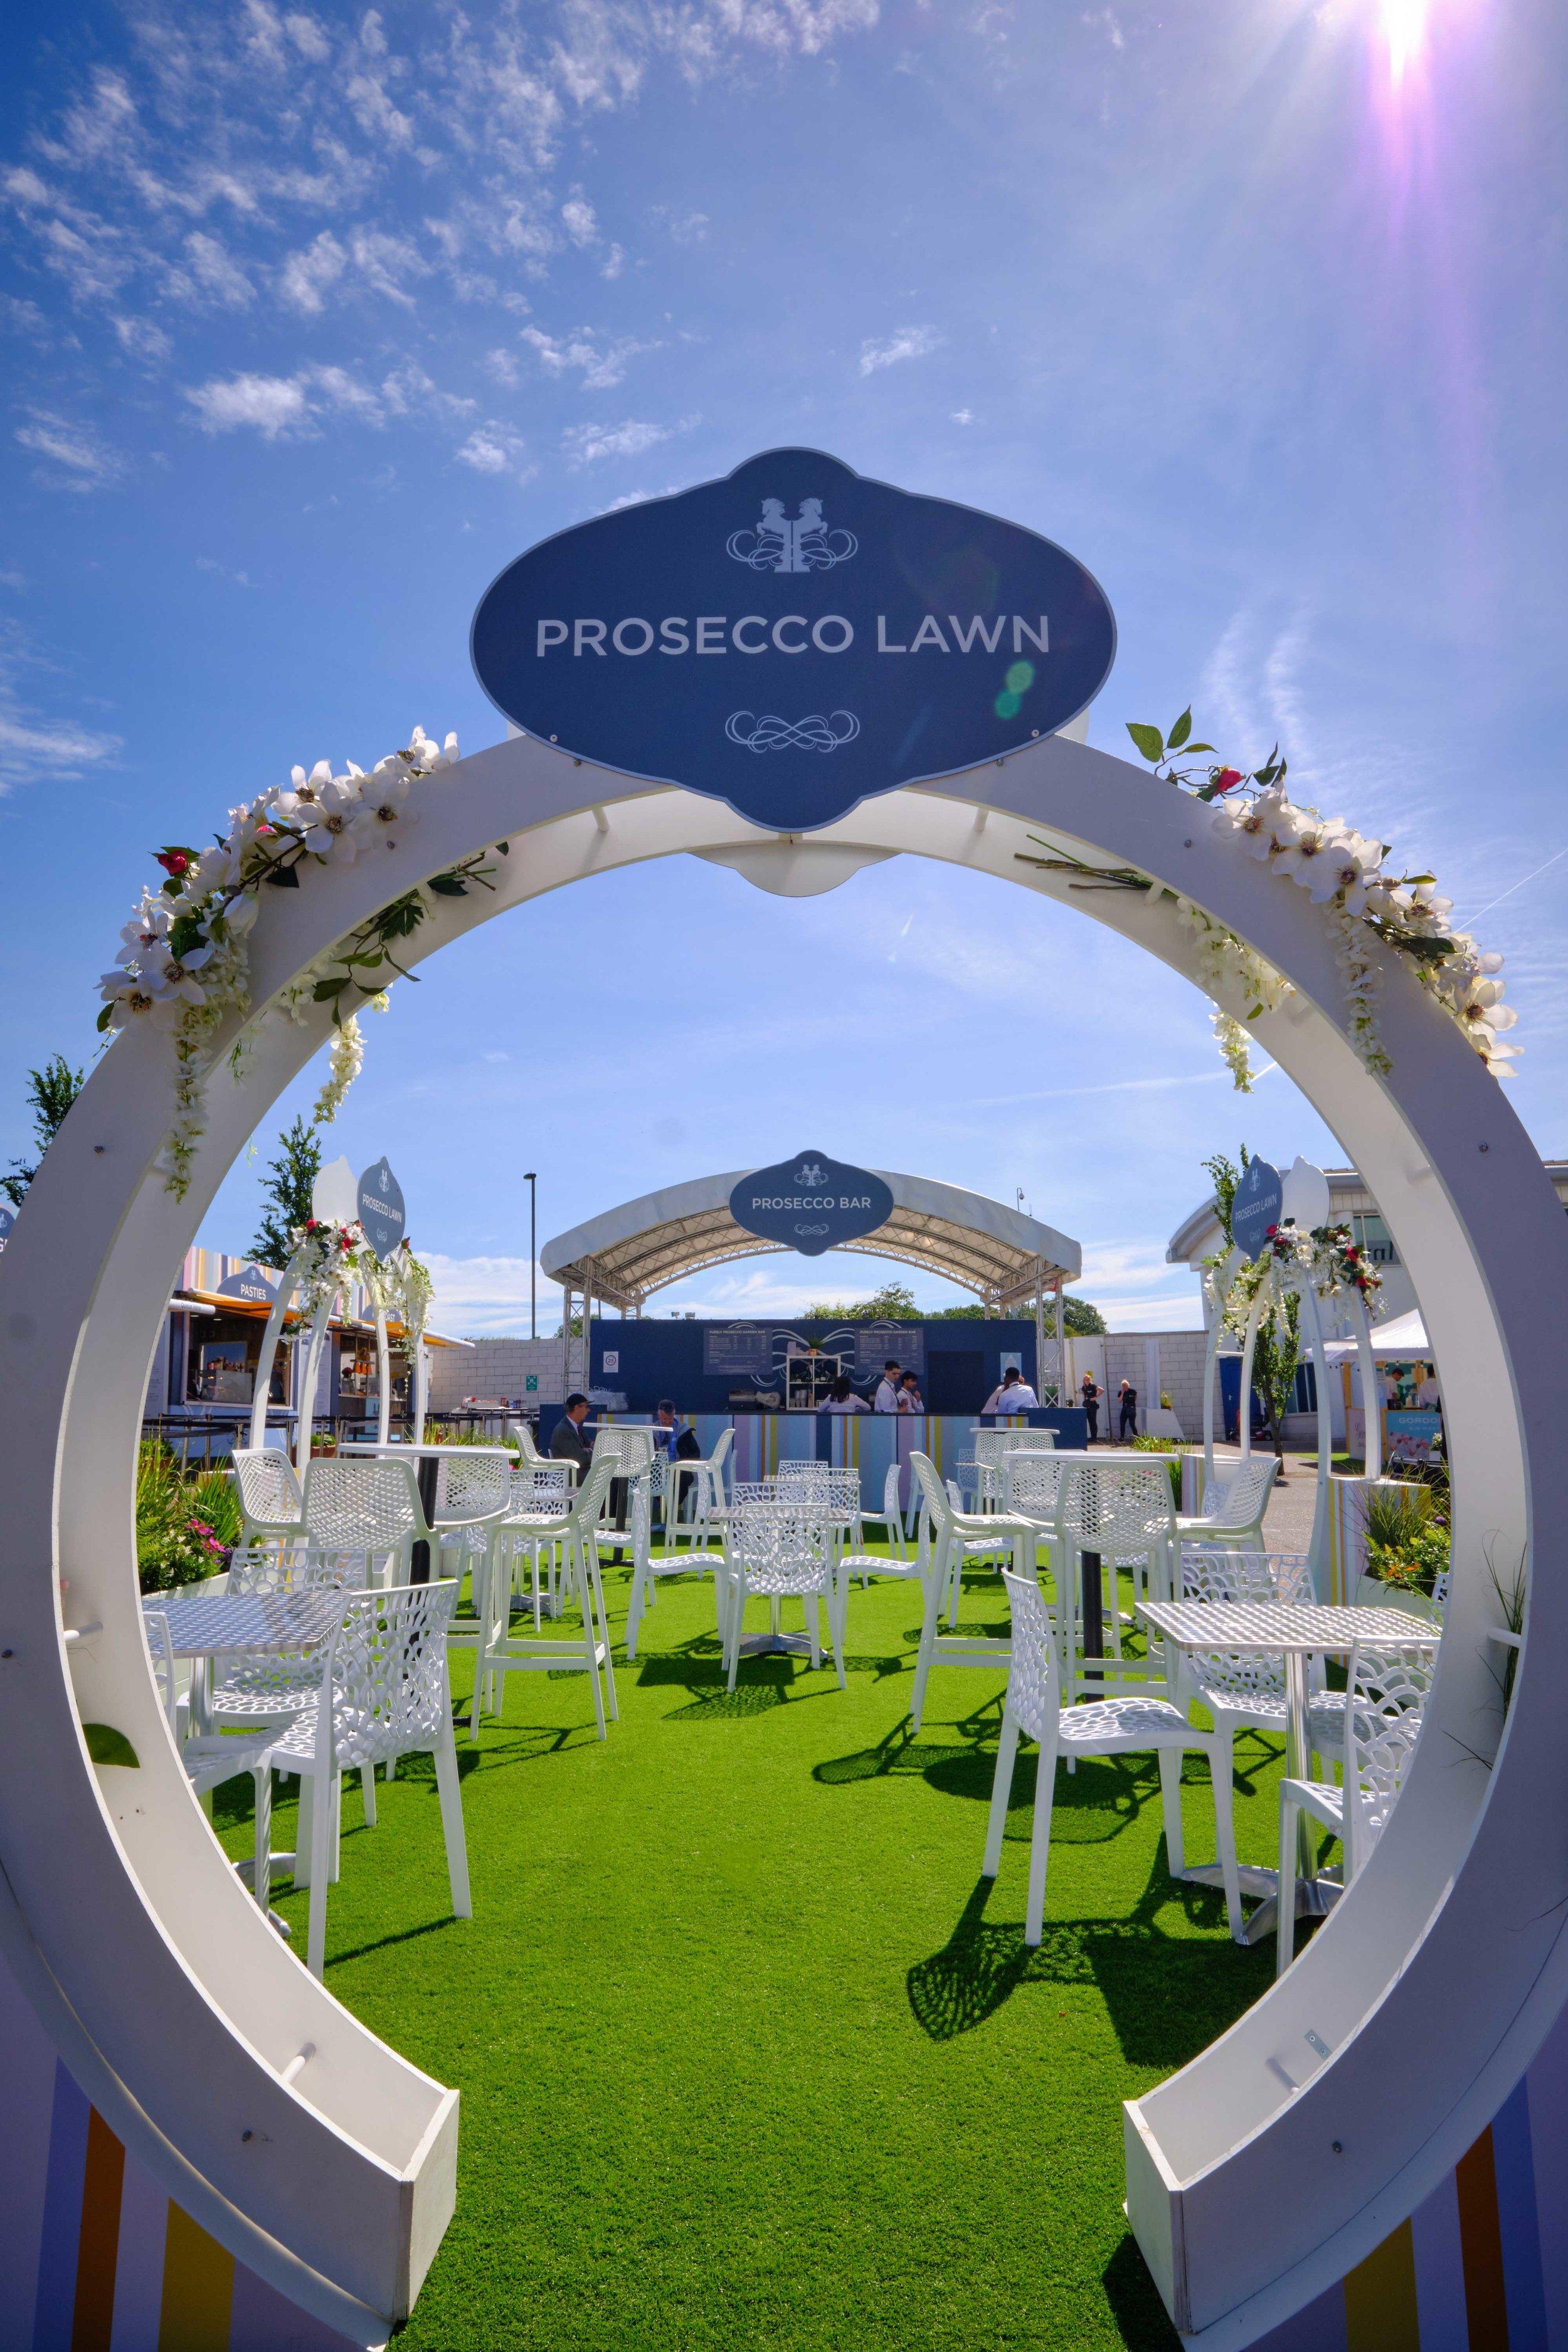 Epsom-Prosecco-Lawn----6.jpg